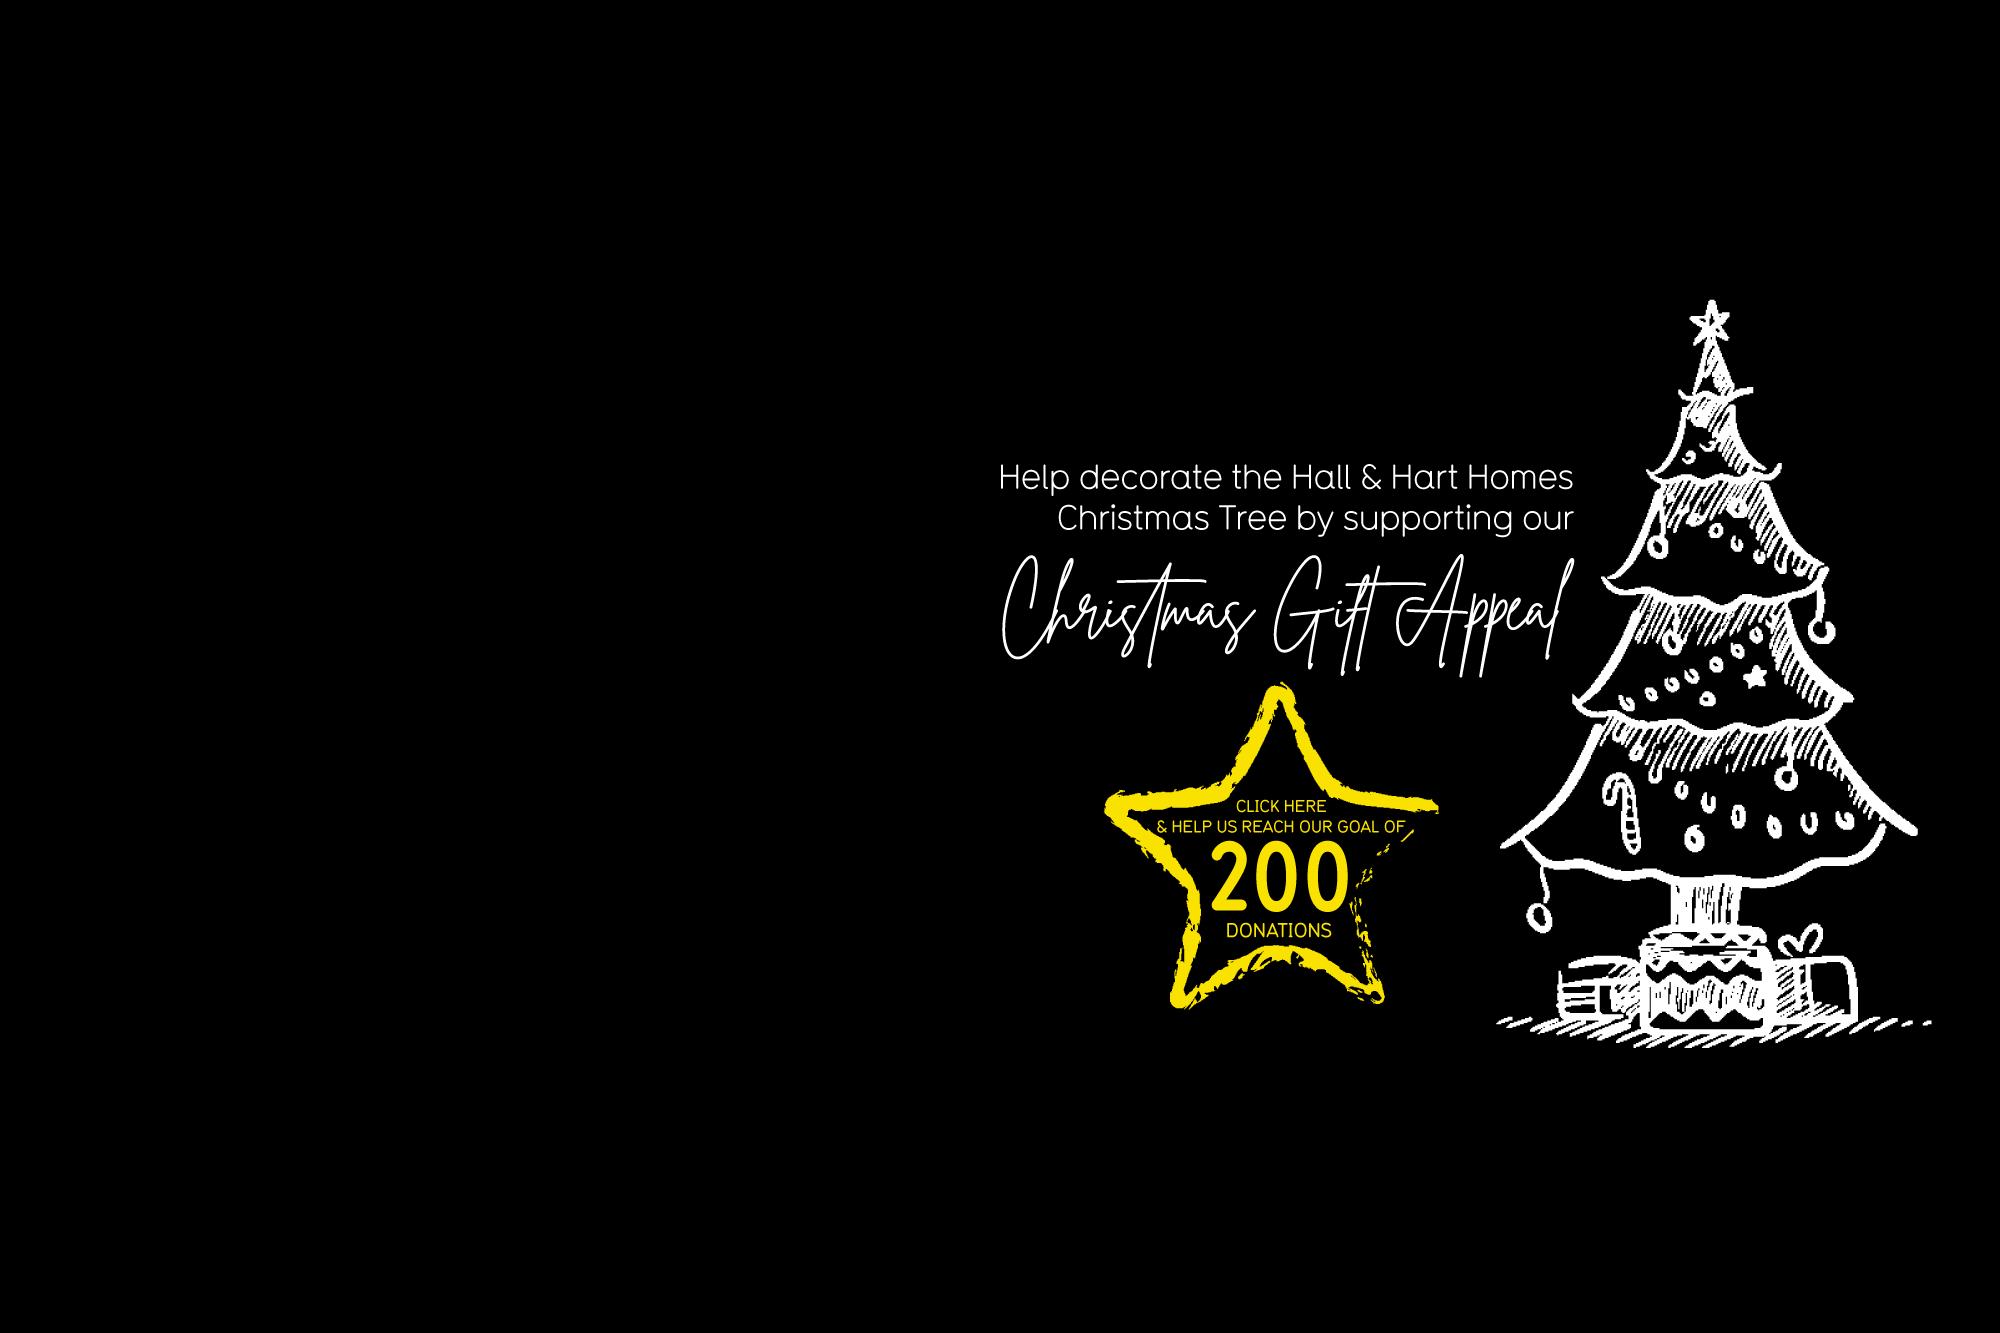 hallharthomes-baranardos-christmas-gift-appeal-home-pagev6